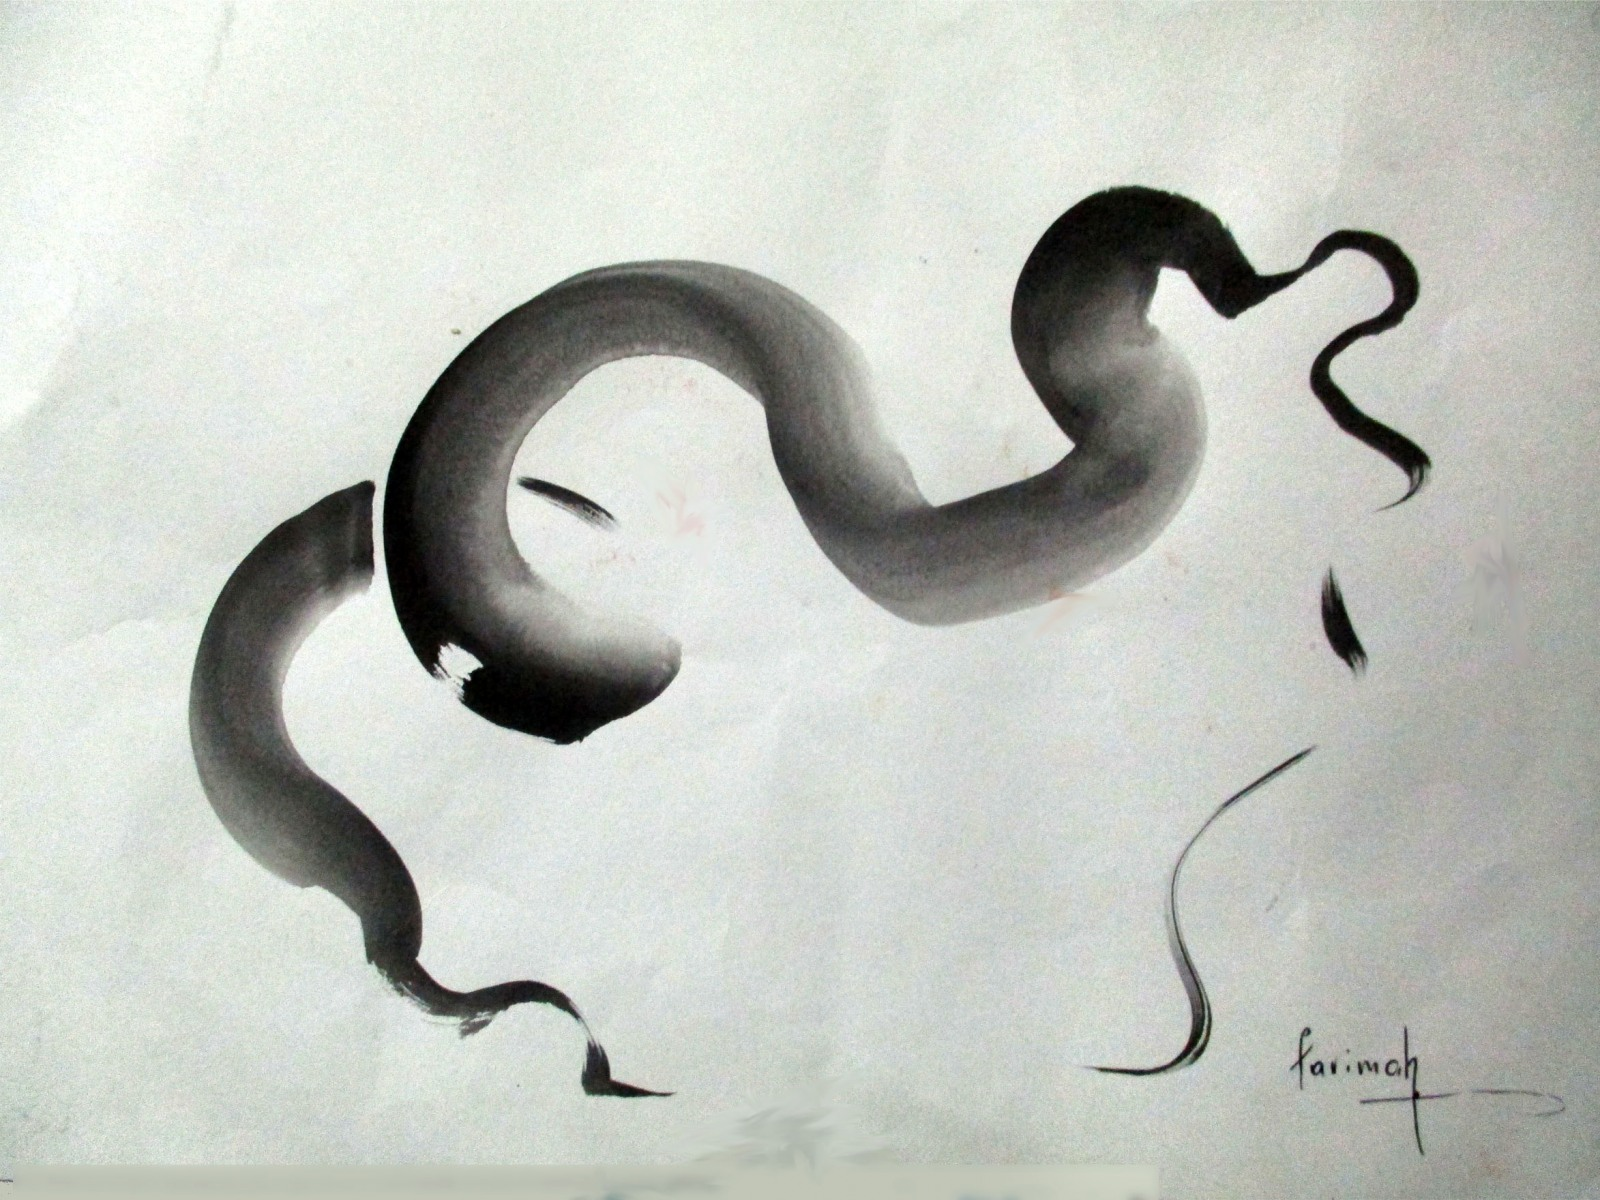 Farimah Eshraghi - Gumtree Branch